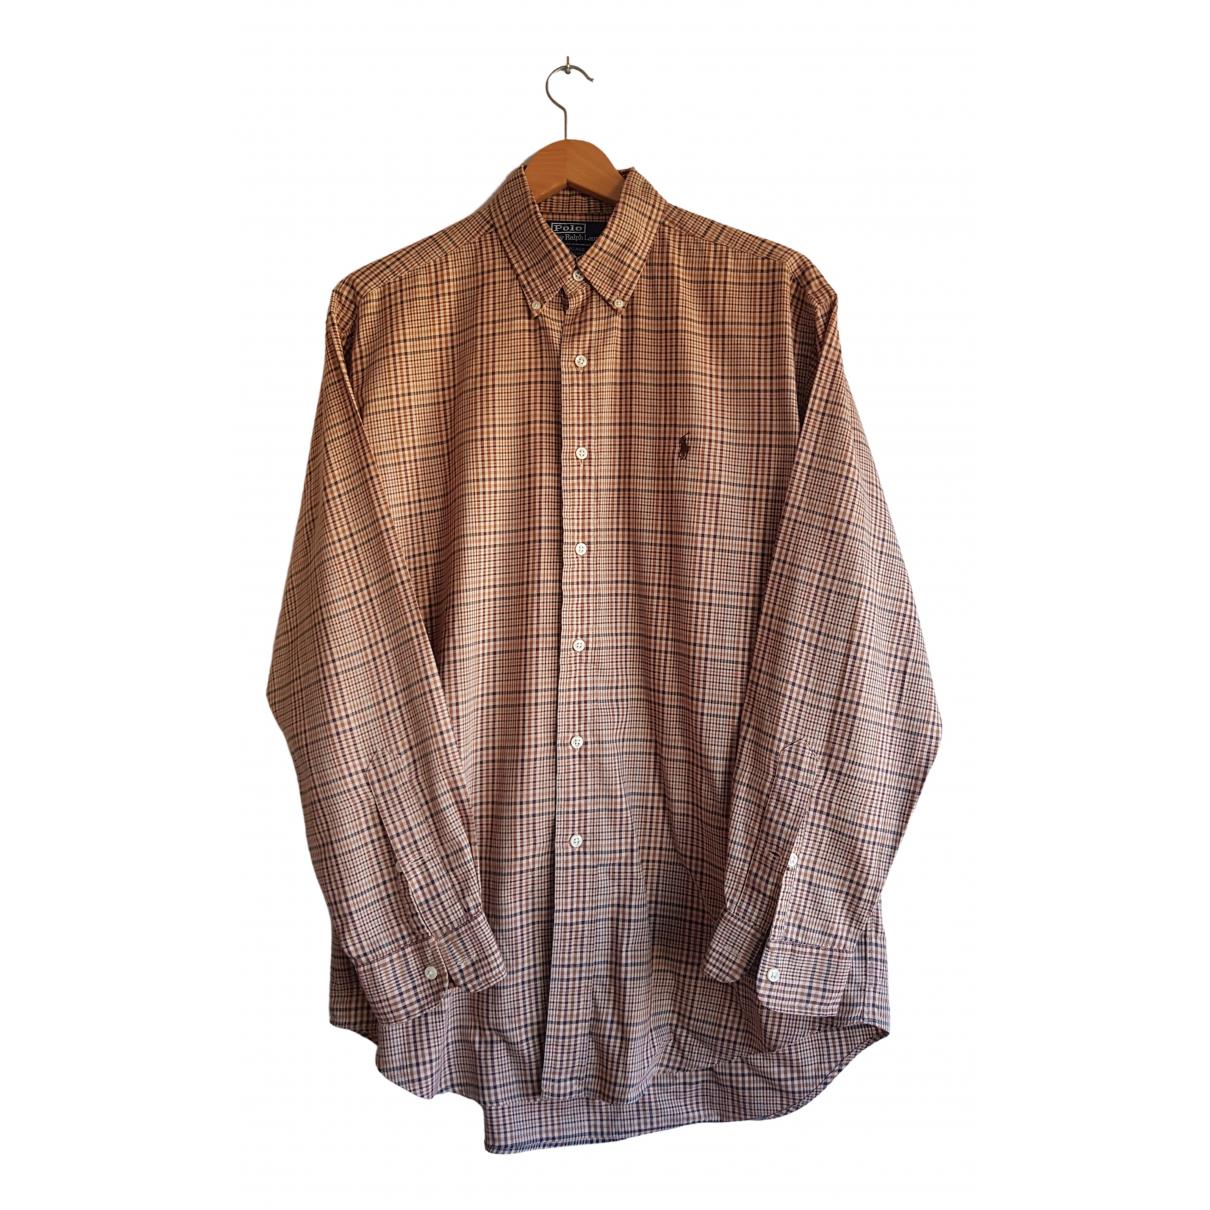 Polo Ralph Lauren \N Brown Cotton Shirts for Men M International